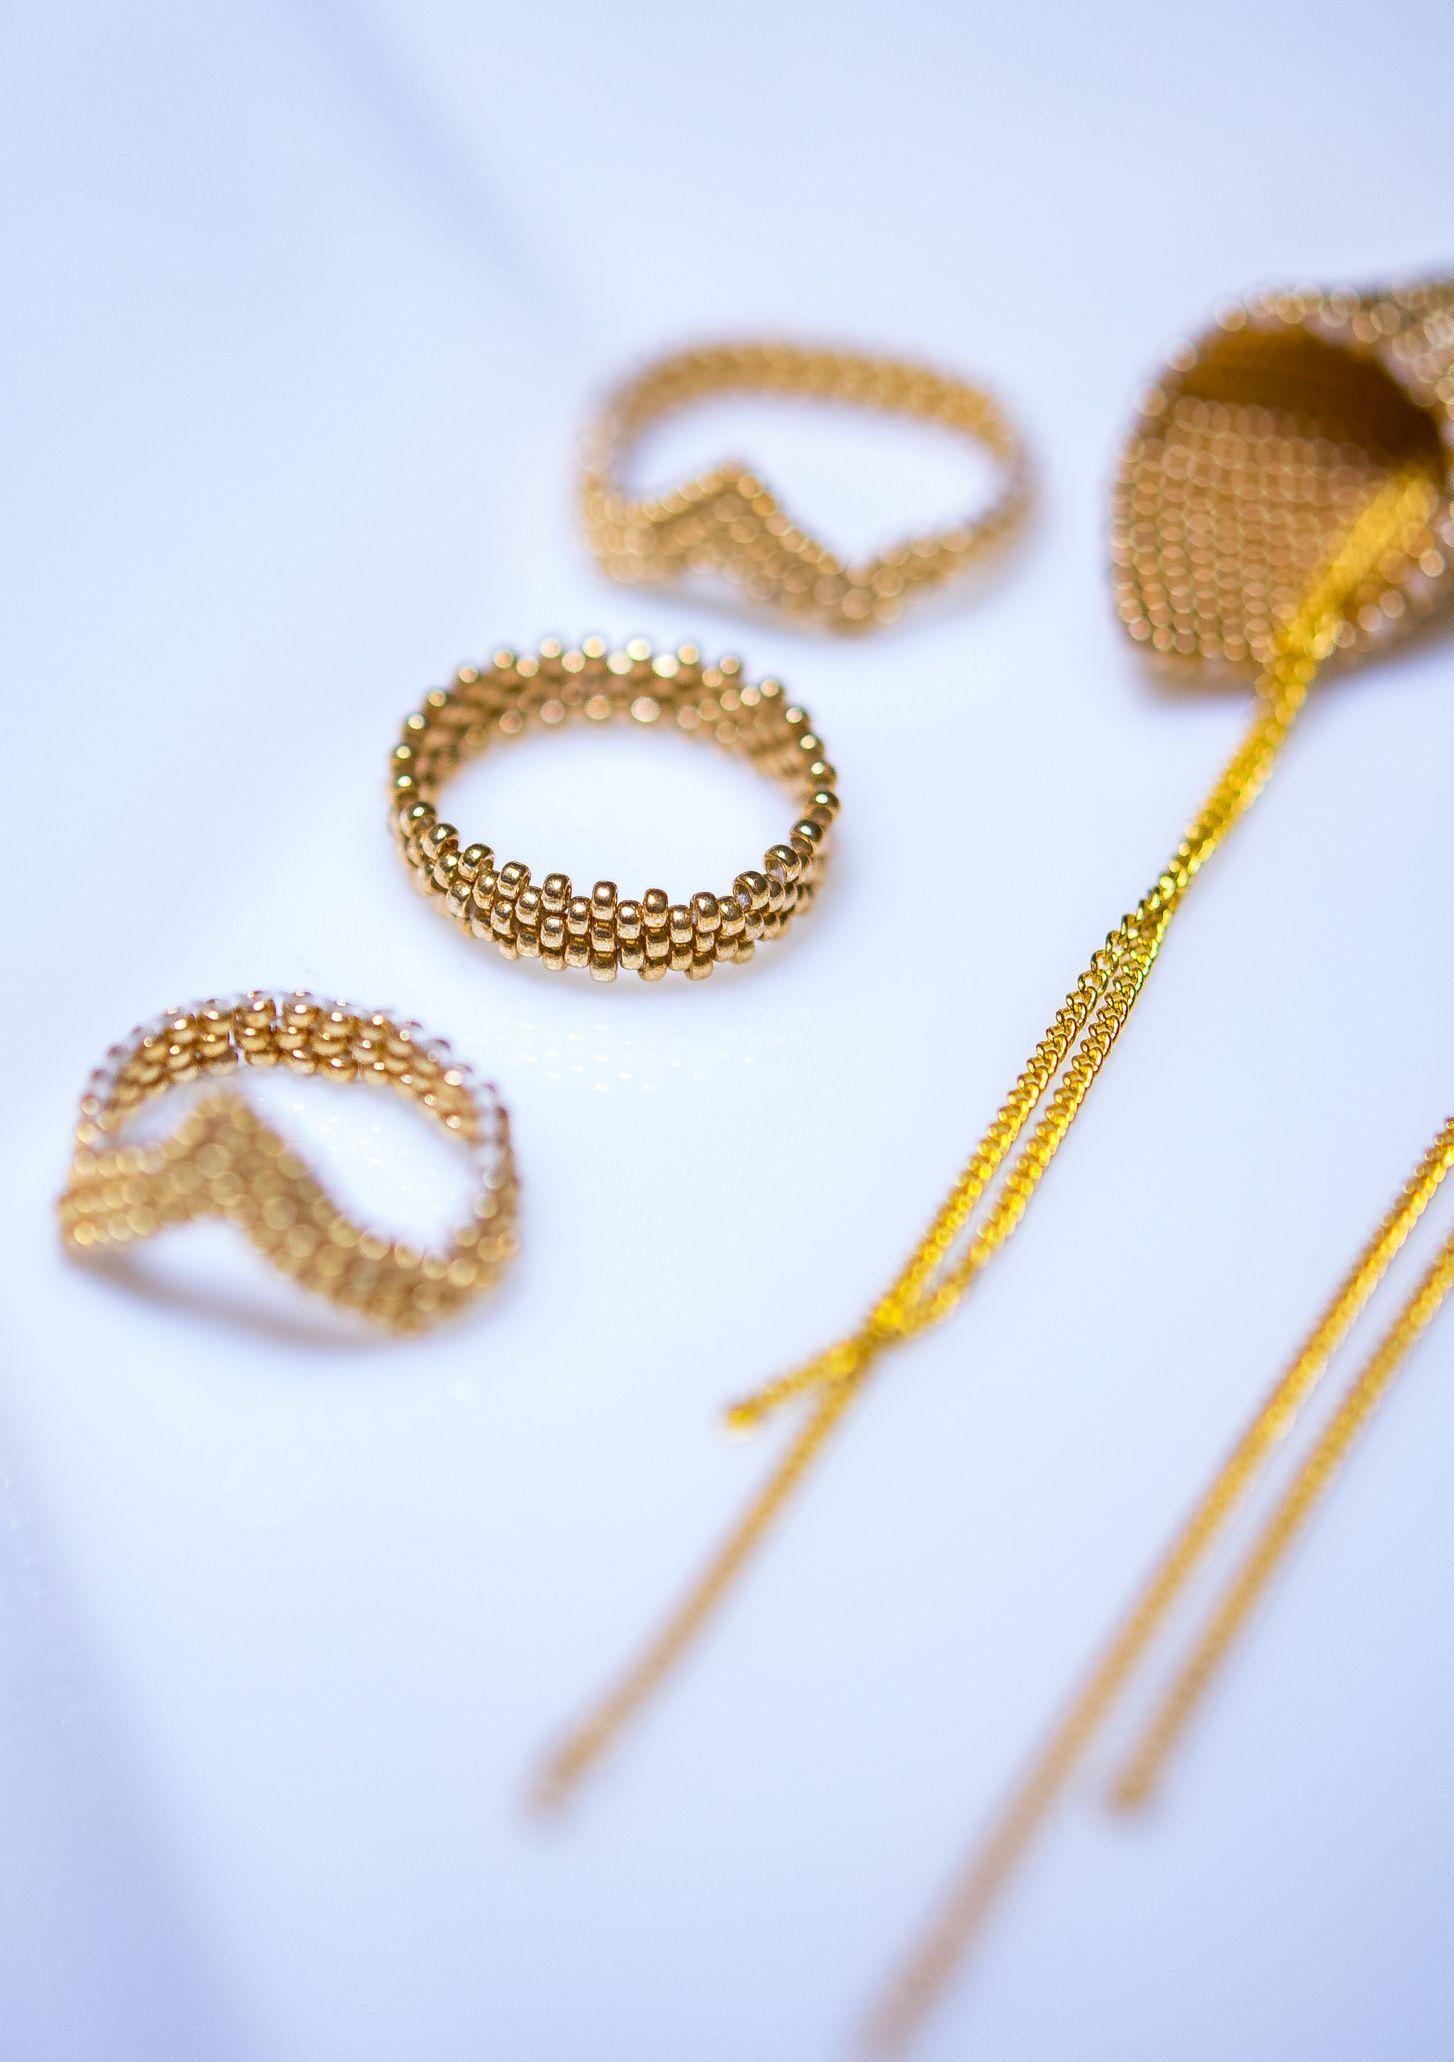 golden, miyuki, beads, madebyme, peyote, earring, bracelet, ring, necklace - golden, miyuki, beads, madebyme, peyote, earring, bracelet, ring, necklace Das schönste Bild für   - #Banglebraceletsdiy #Beads #Bracelet #diyjewelrymaking #Earring #Golden #goldennecklake #Leatherjewelrydiy #madebyme #Miyuki #Necklace #Peyote #Ring